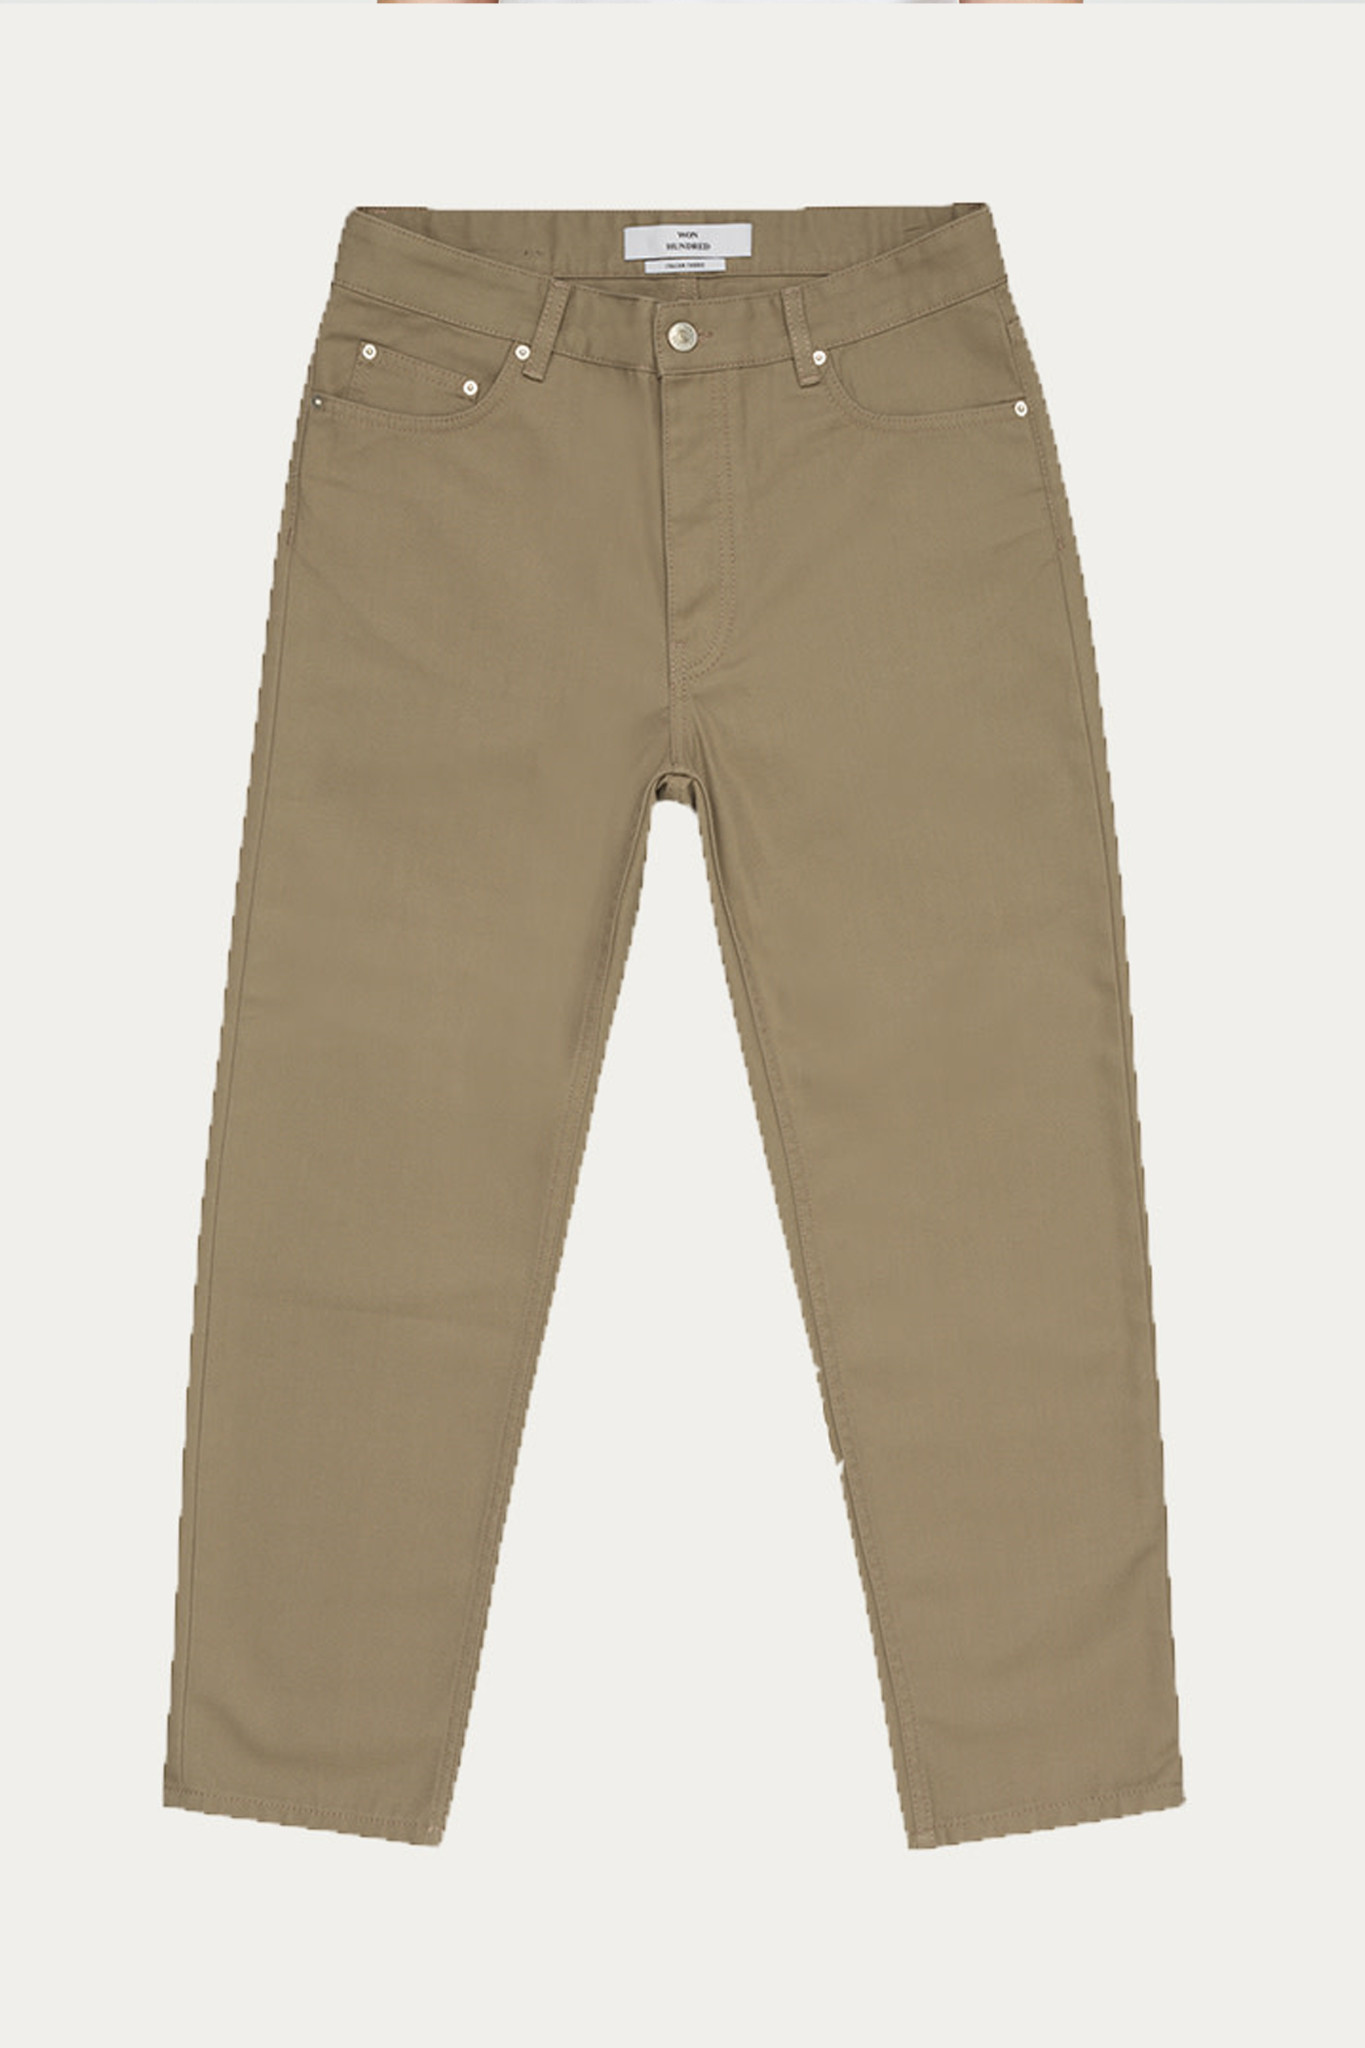 Ben Jeans - Khaki-1